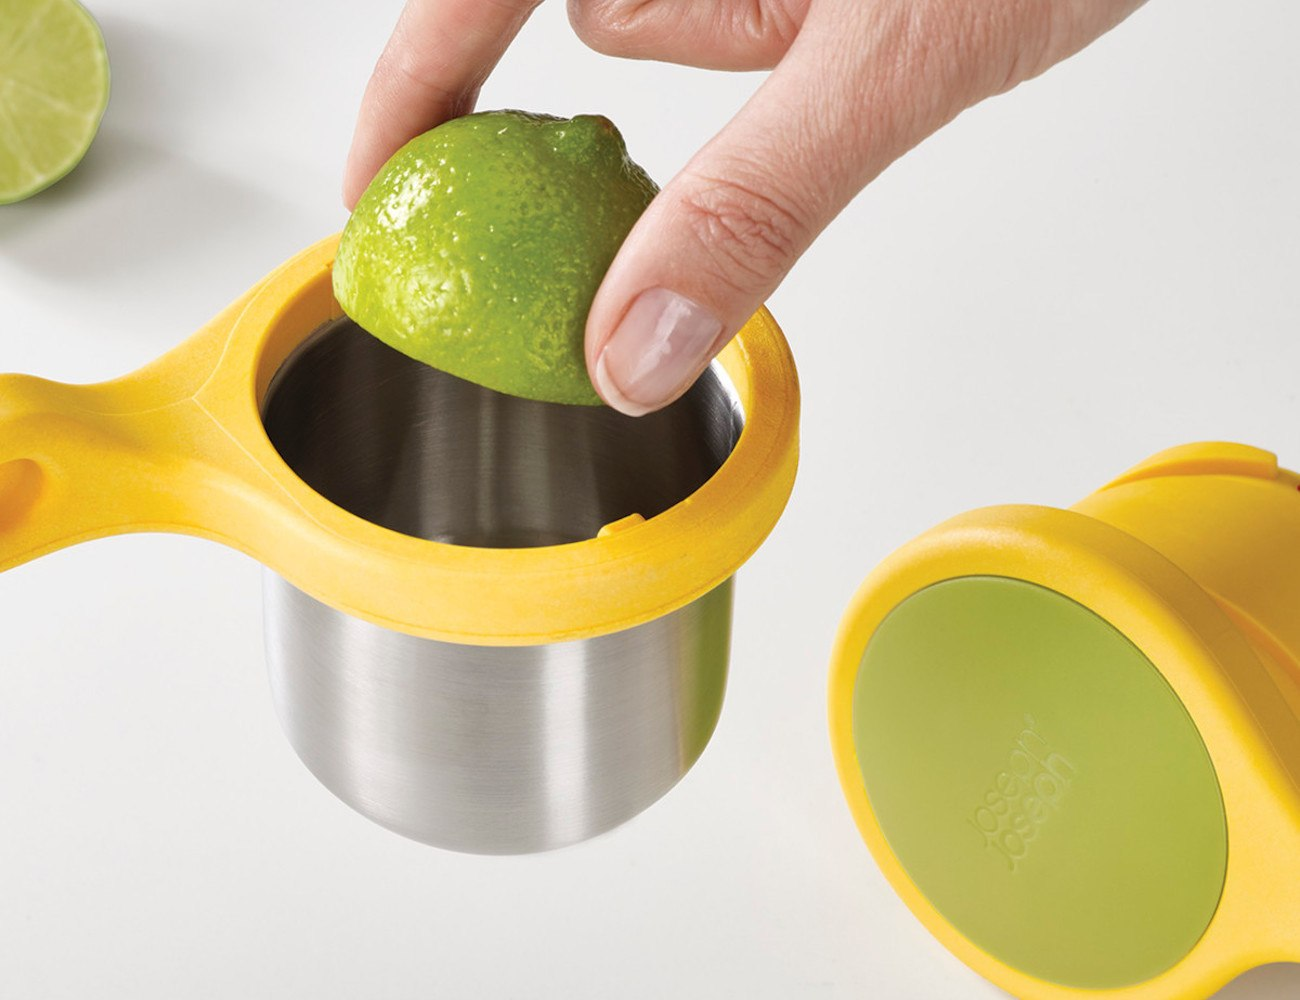 Joseph Joseph Helix Hand-Held Citrus Press